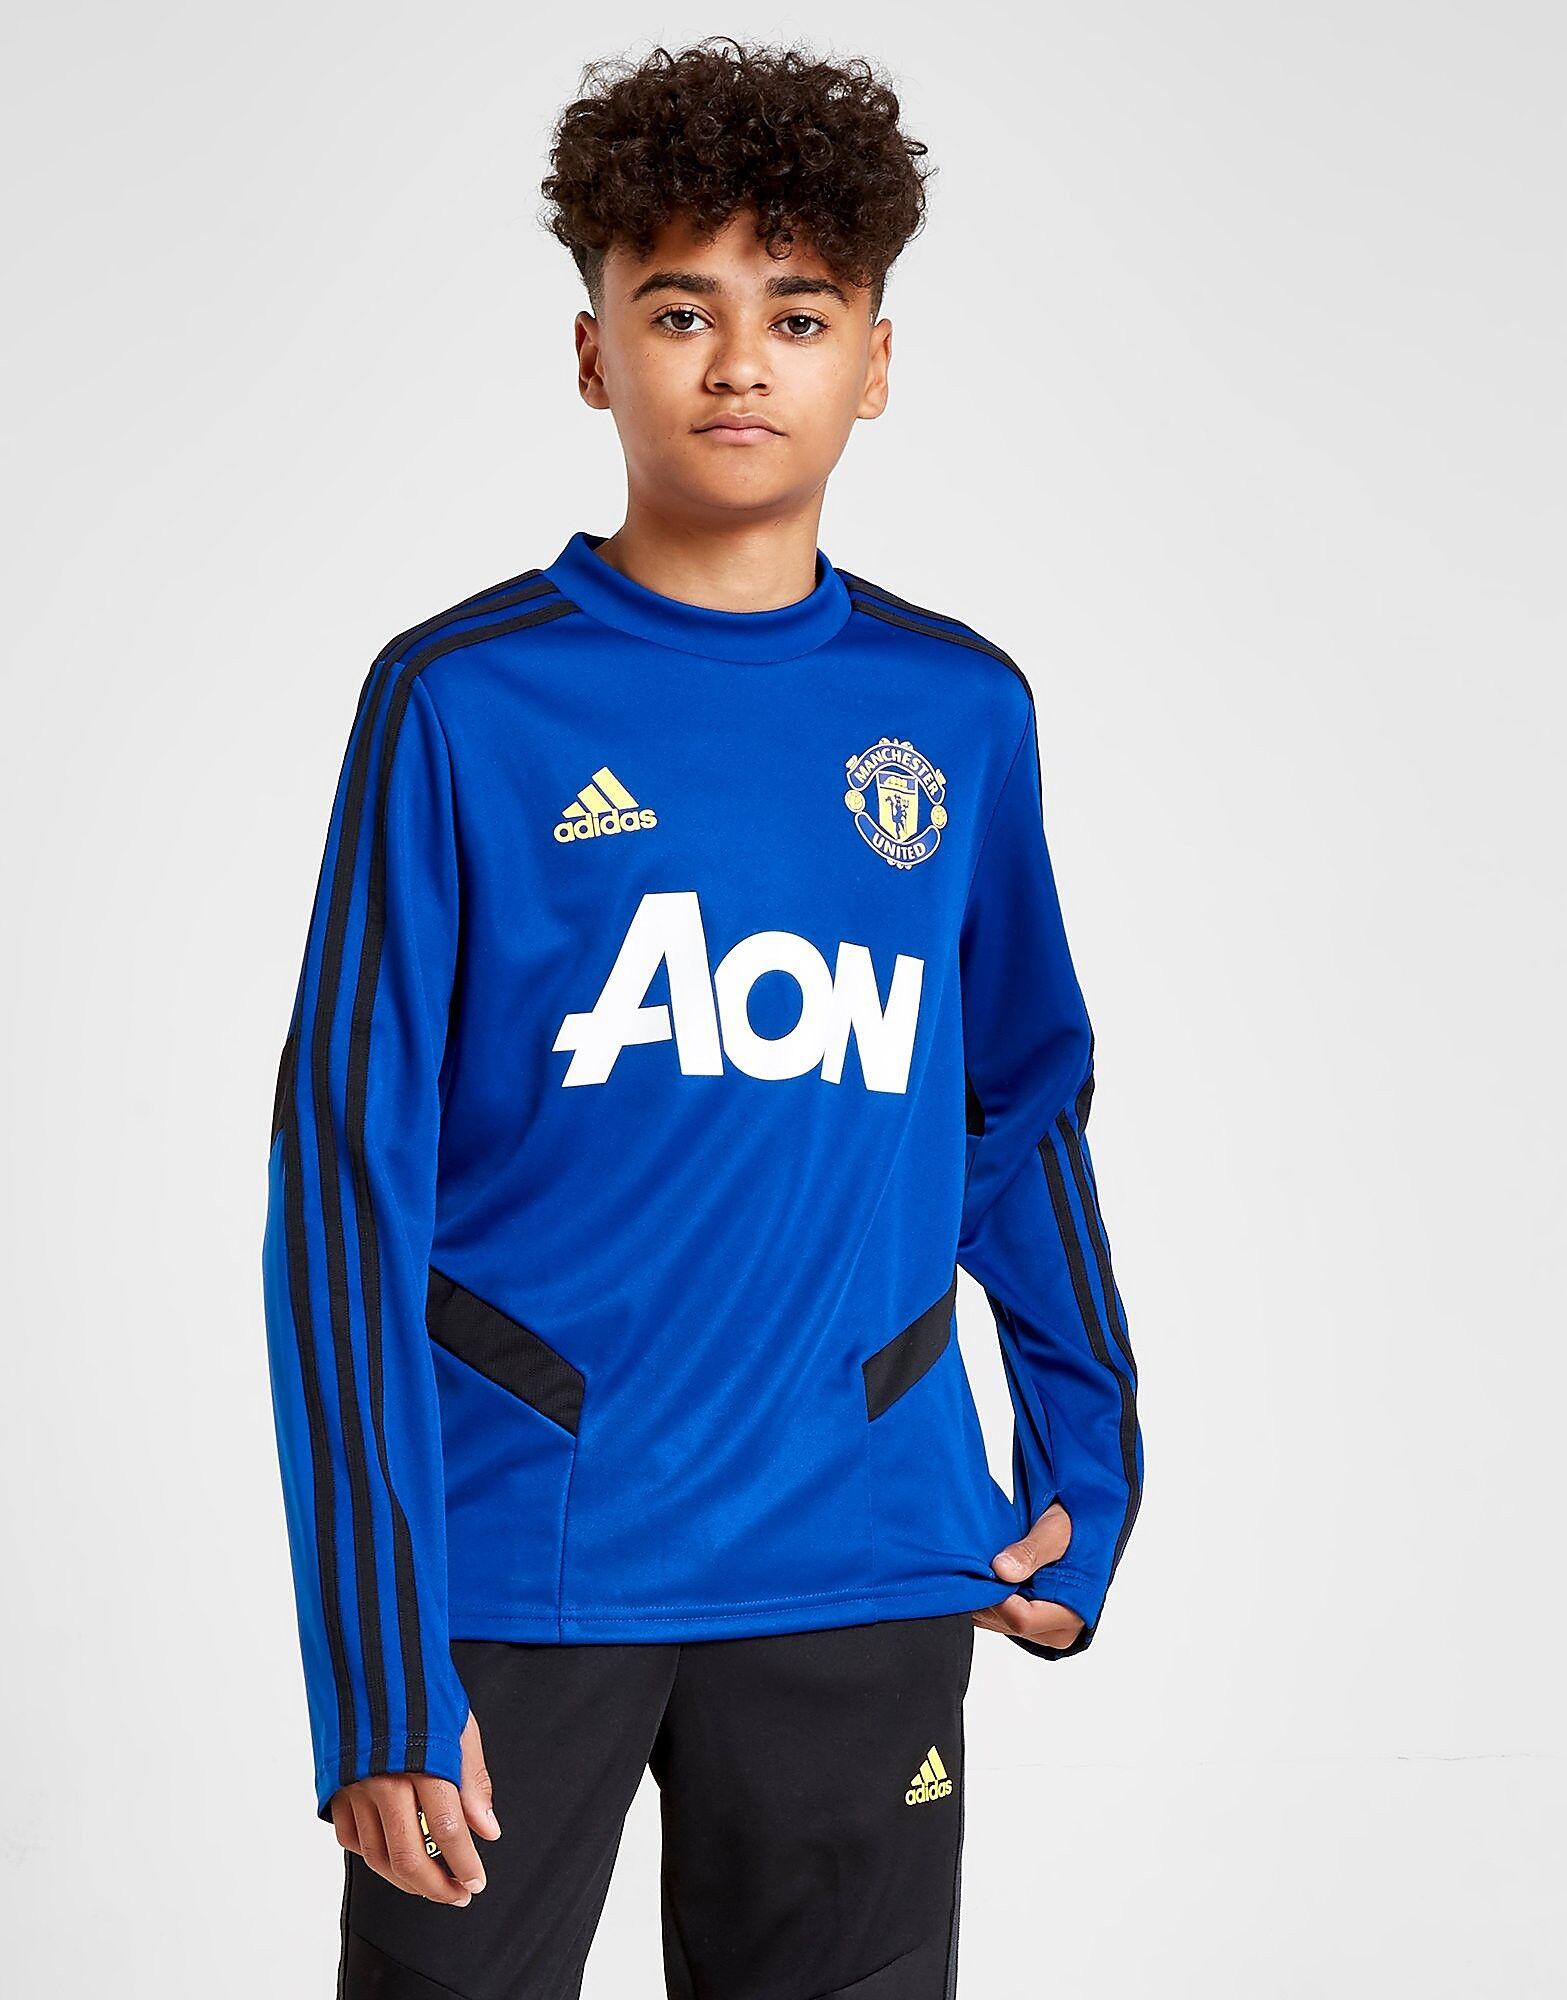 Image of Adidas Manchester United FC Treenipaita Juniorit - Kids, Sininen